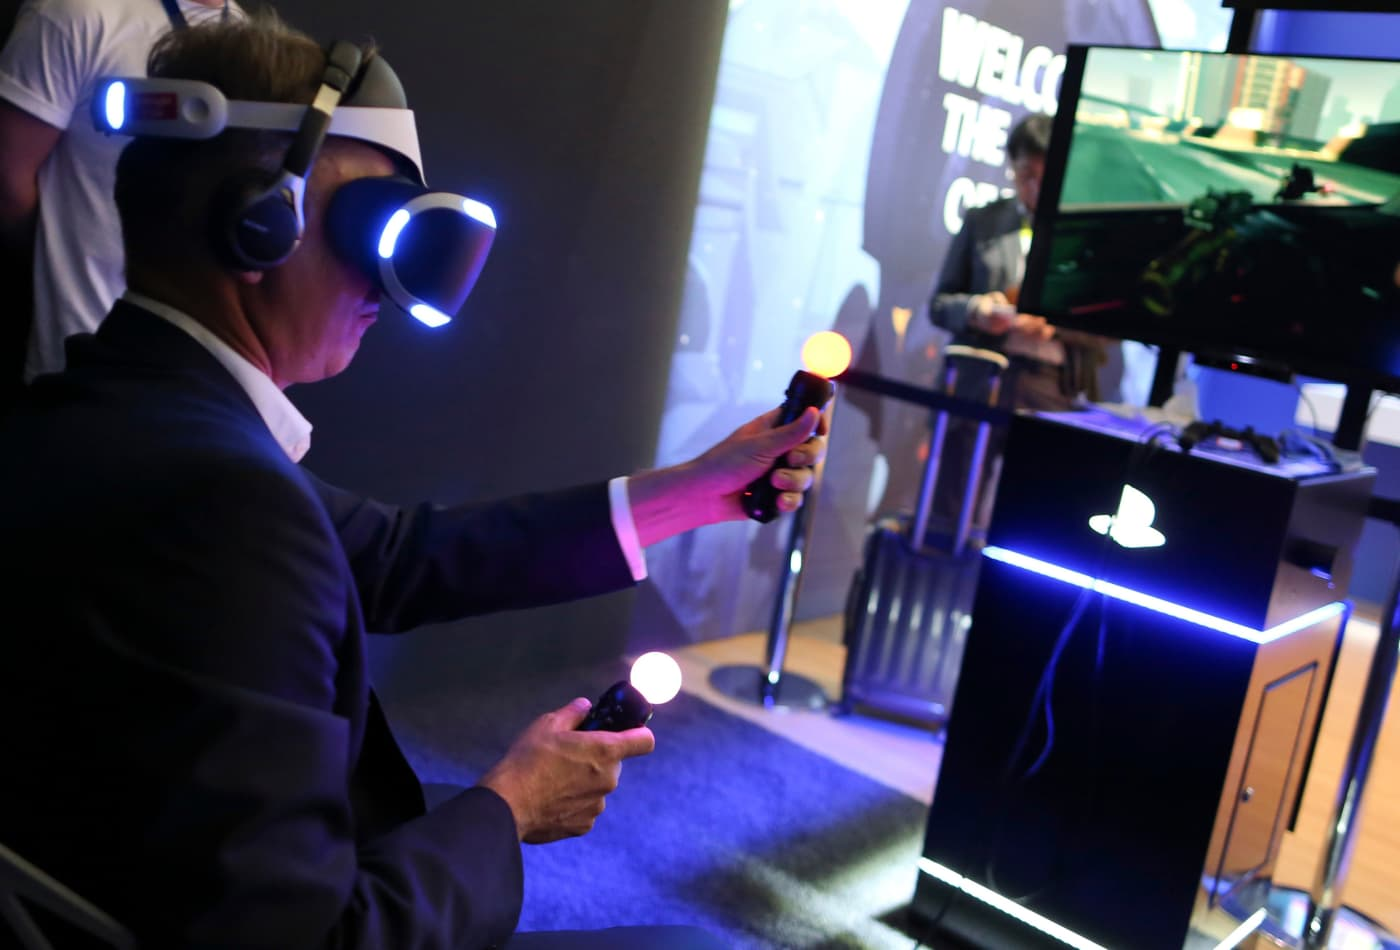 Virtual reality for gaming & beyond